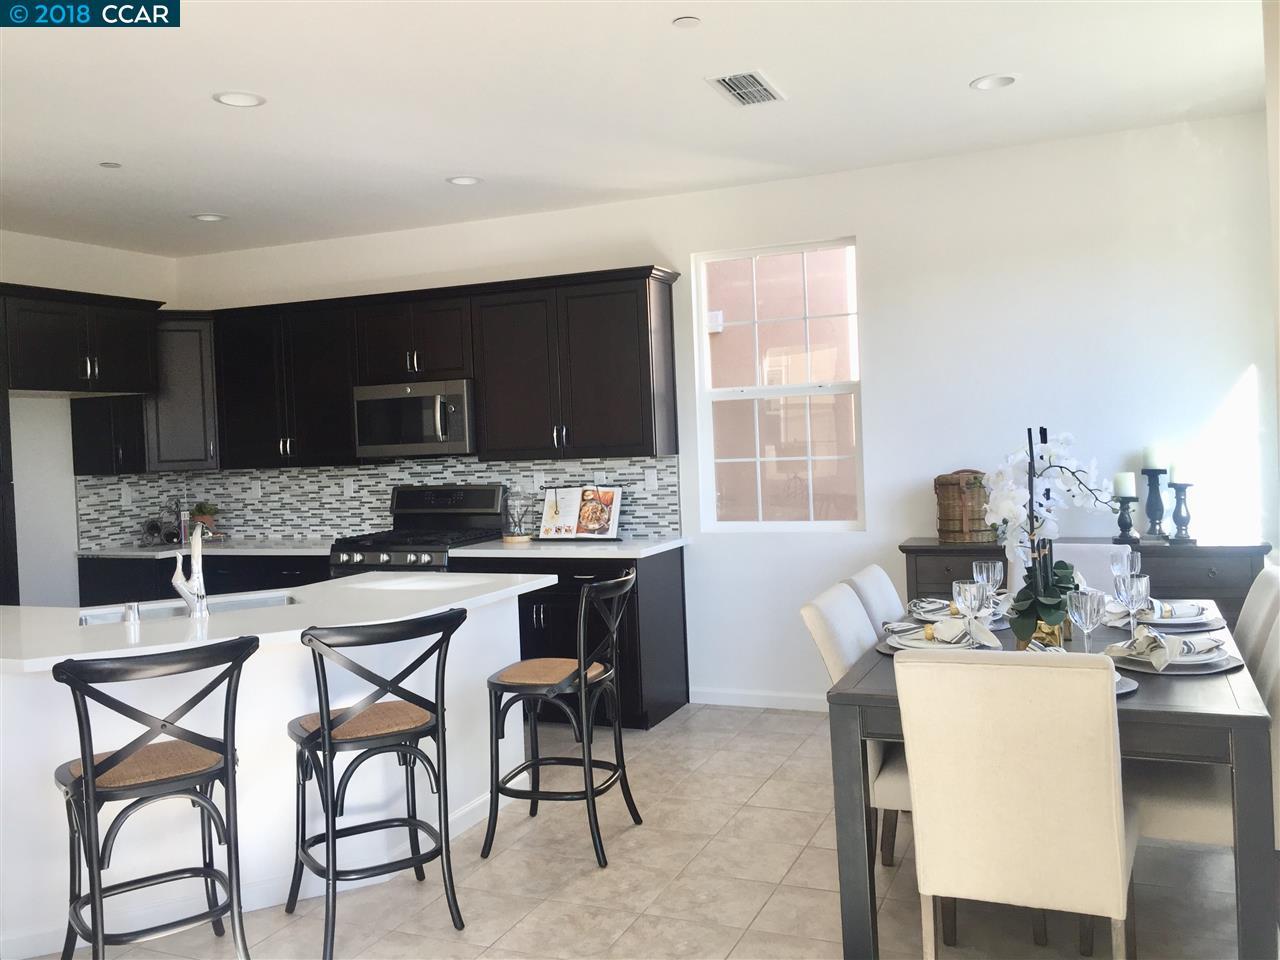 واحد منزل الأسرة للـ Sale في 463 Colina Way 463 Colina Way El Sobrante, California 94803 United States